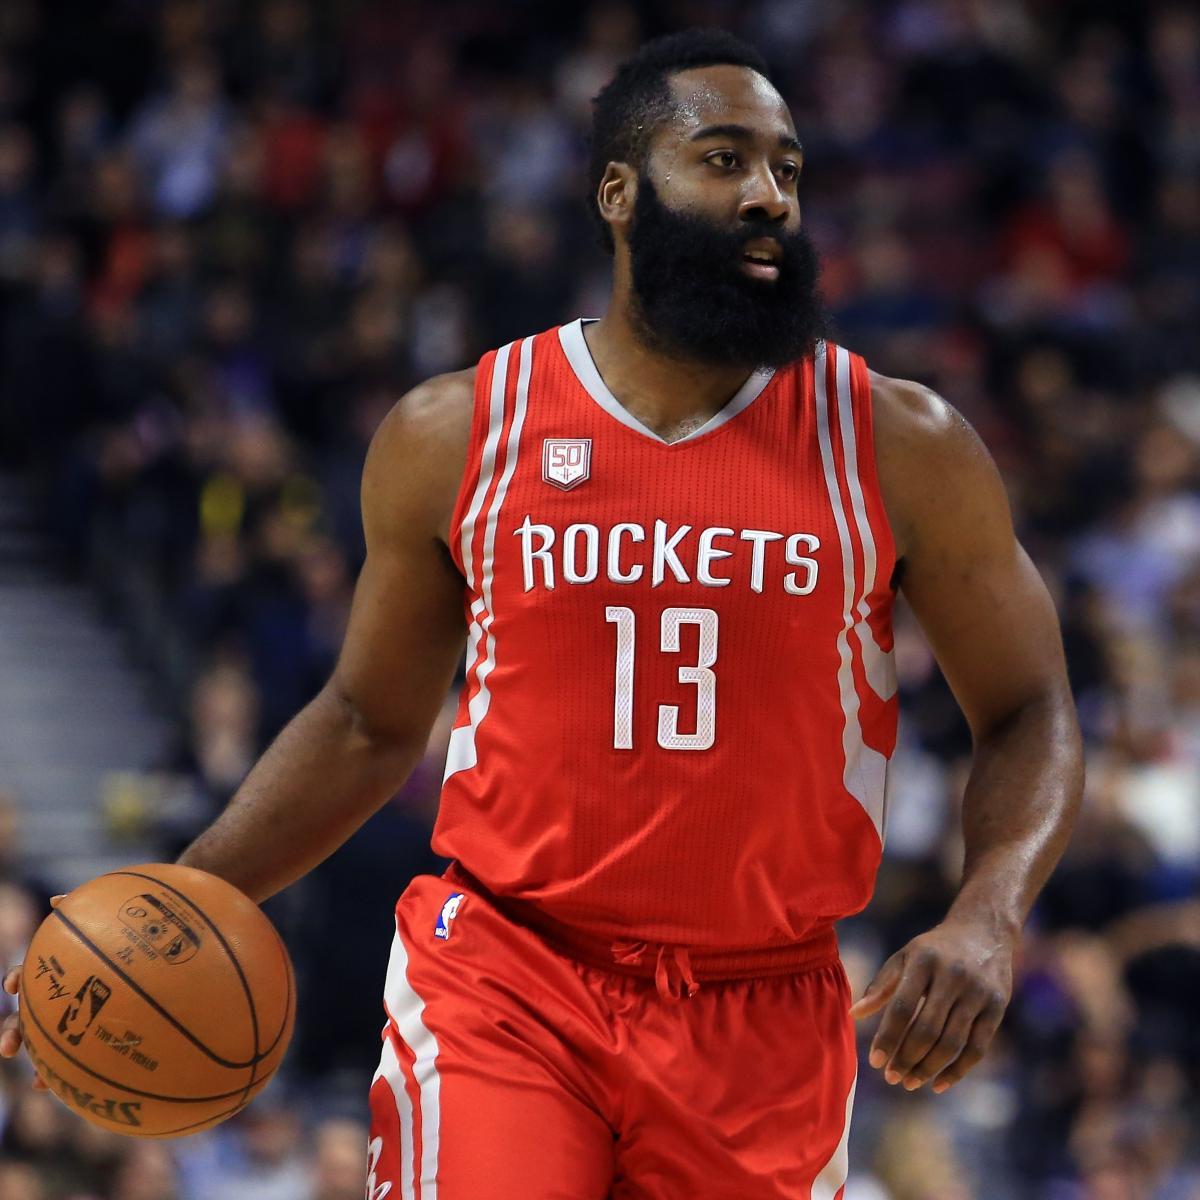 Houston Rockets 3rd Quarter Stats: James Harden Vs. Raptors: Stats, Highlights And Reaction